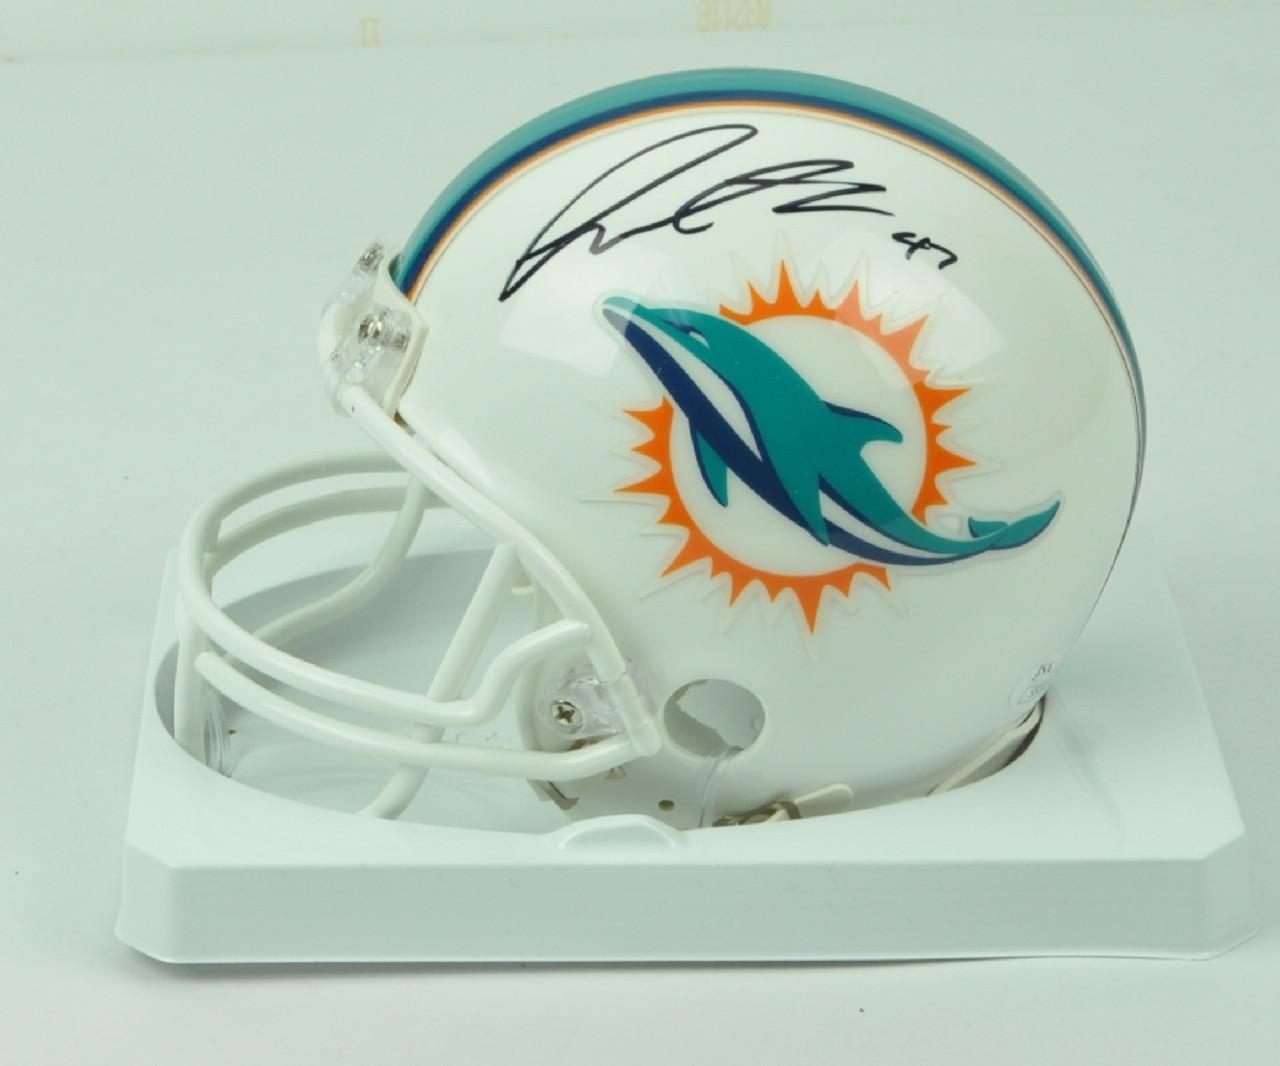 19deb828 NFL Miami Dolphins Linebacker Kiko Alonso 47 Signed Autographed Riddell  Mini Helmet JSA